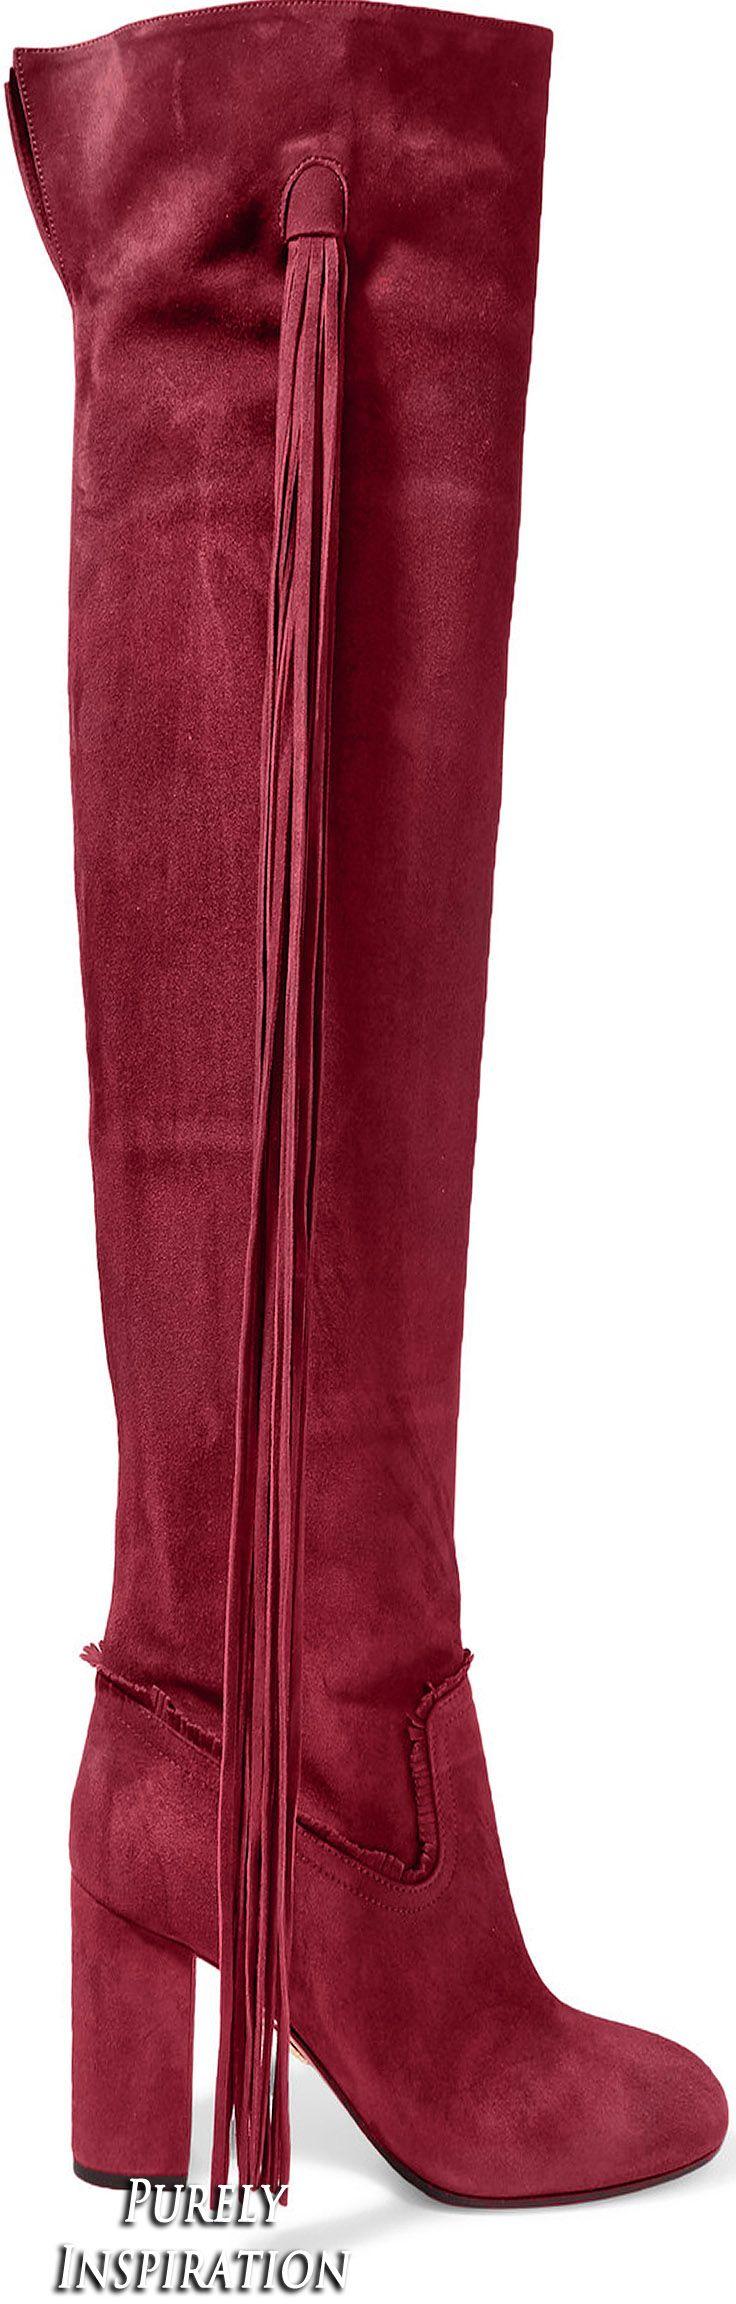 Aquazzura Tasseled suede boots | Purely Inspiration